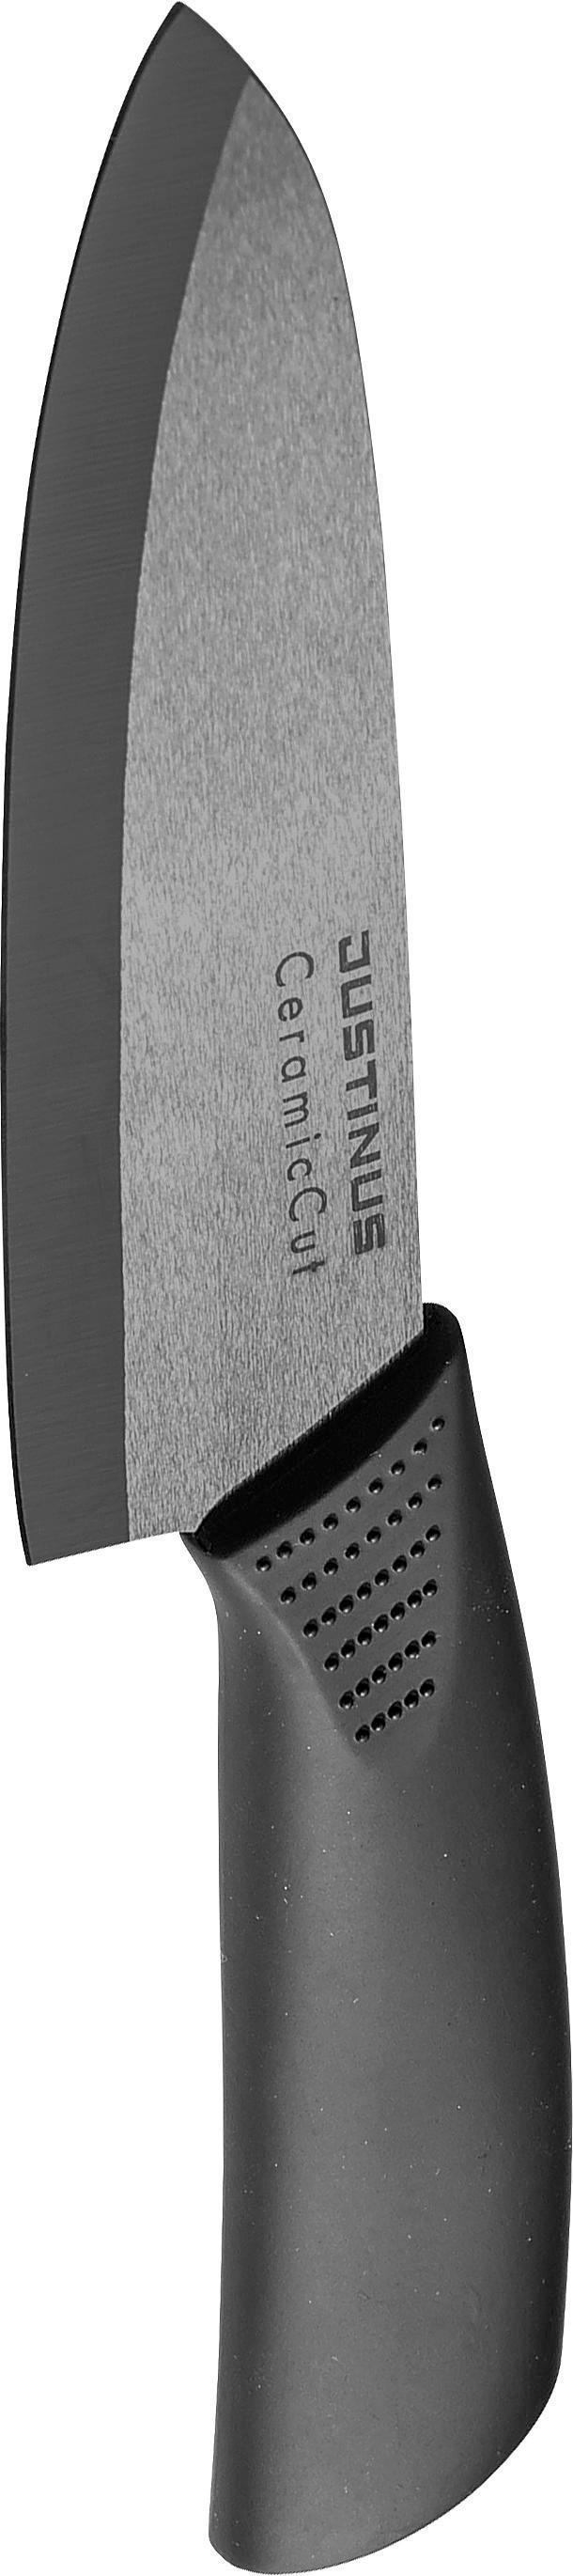 KUHINJSKI NOŽ - črna, Konvencionalno, umetna masa/keramika (33cm) - JUSTINUS